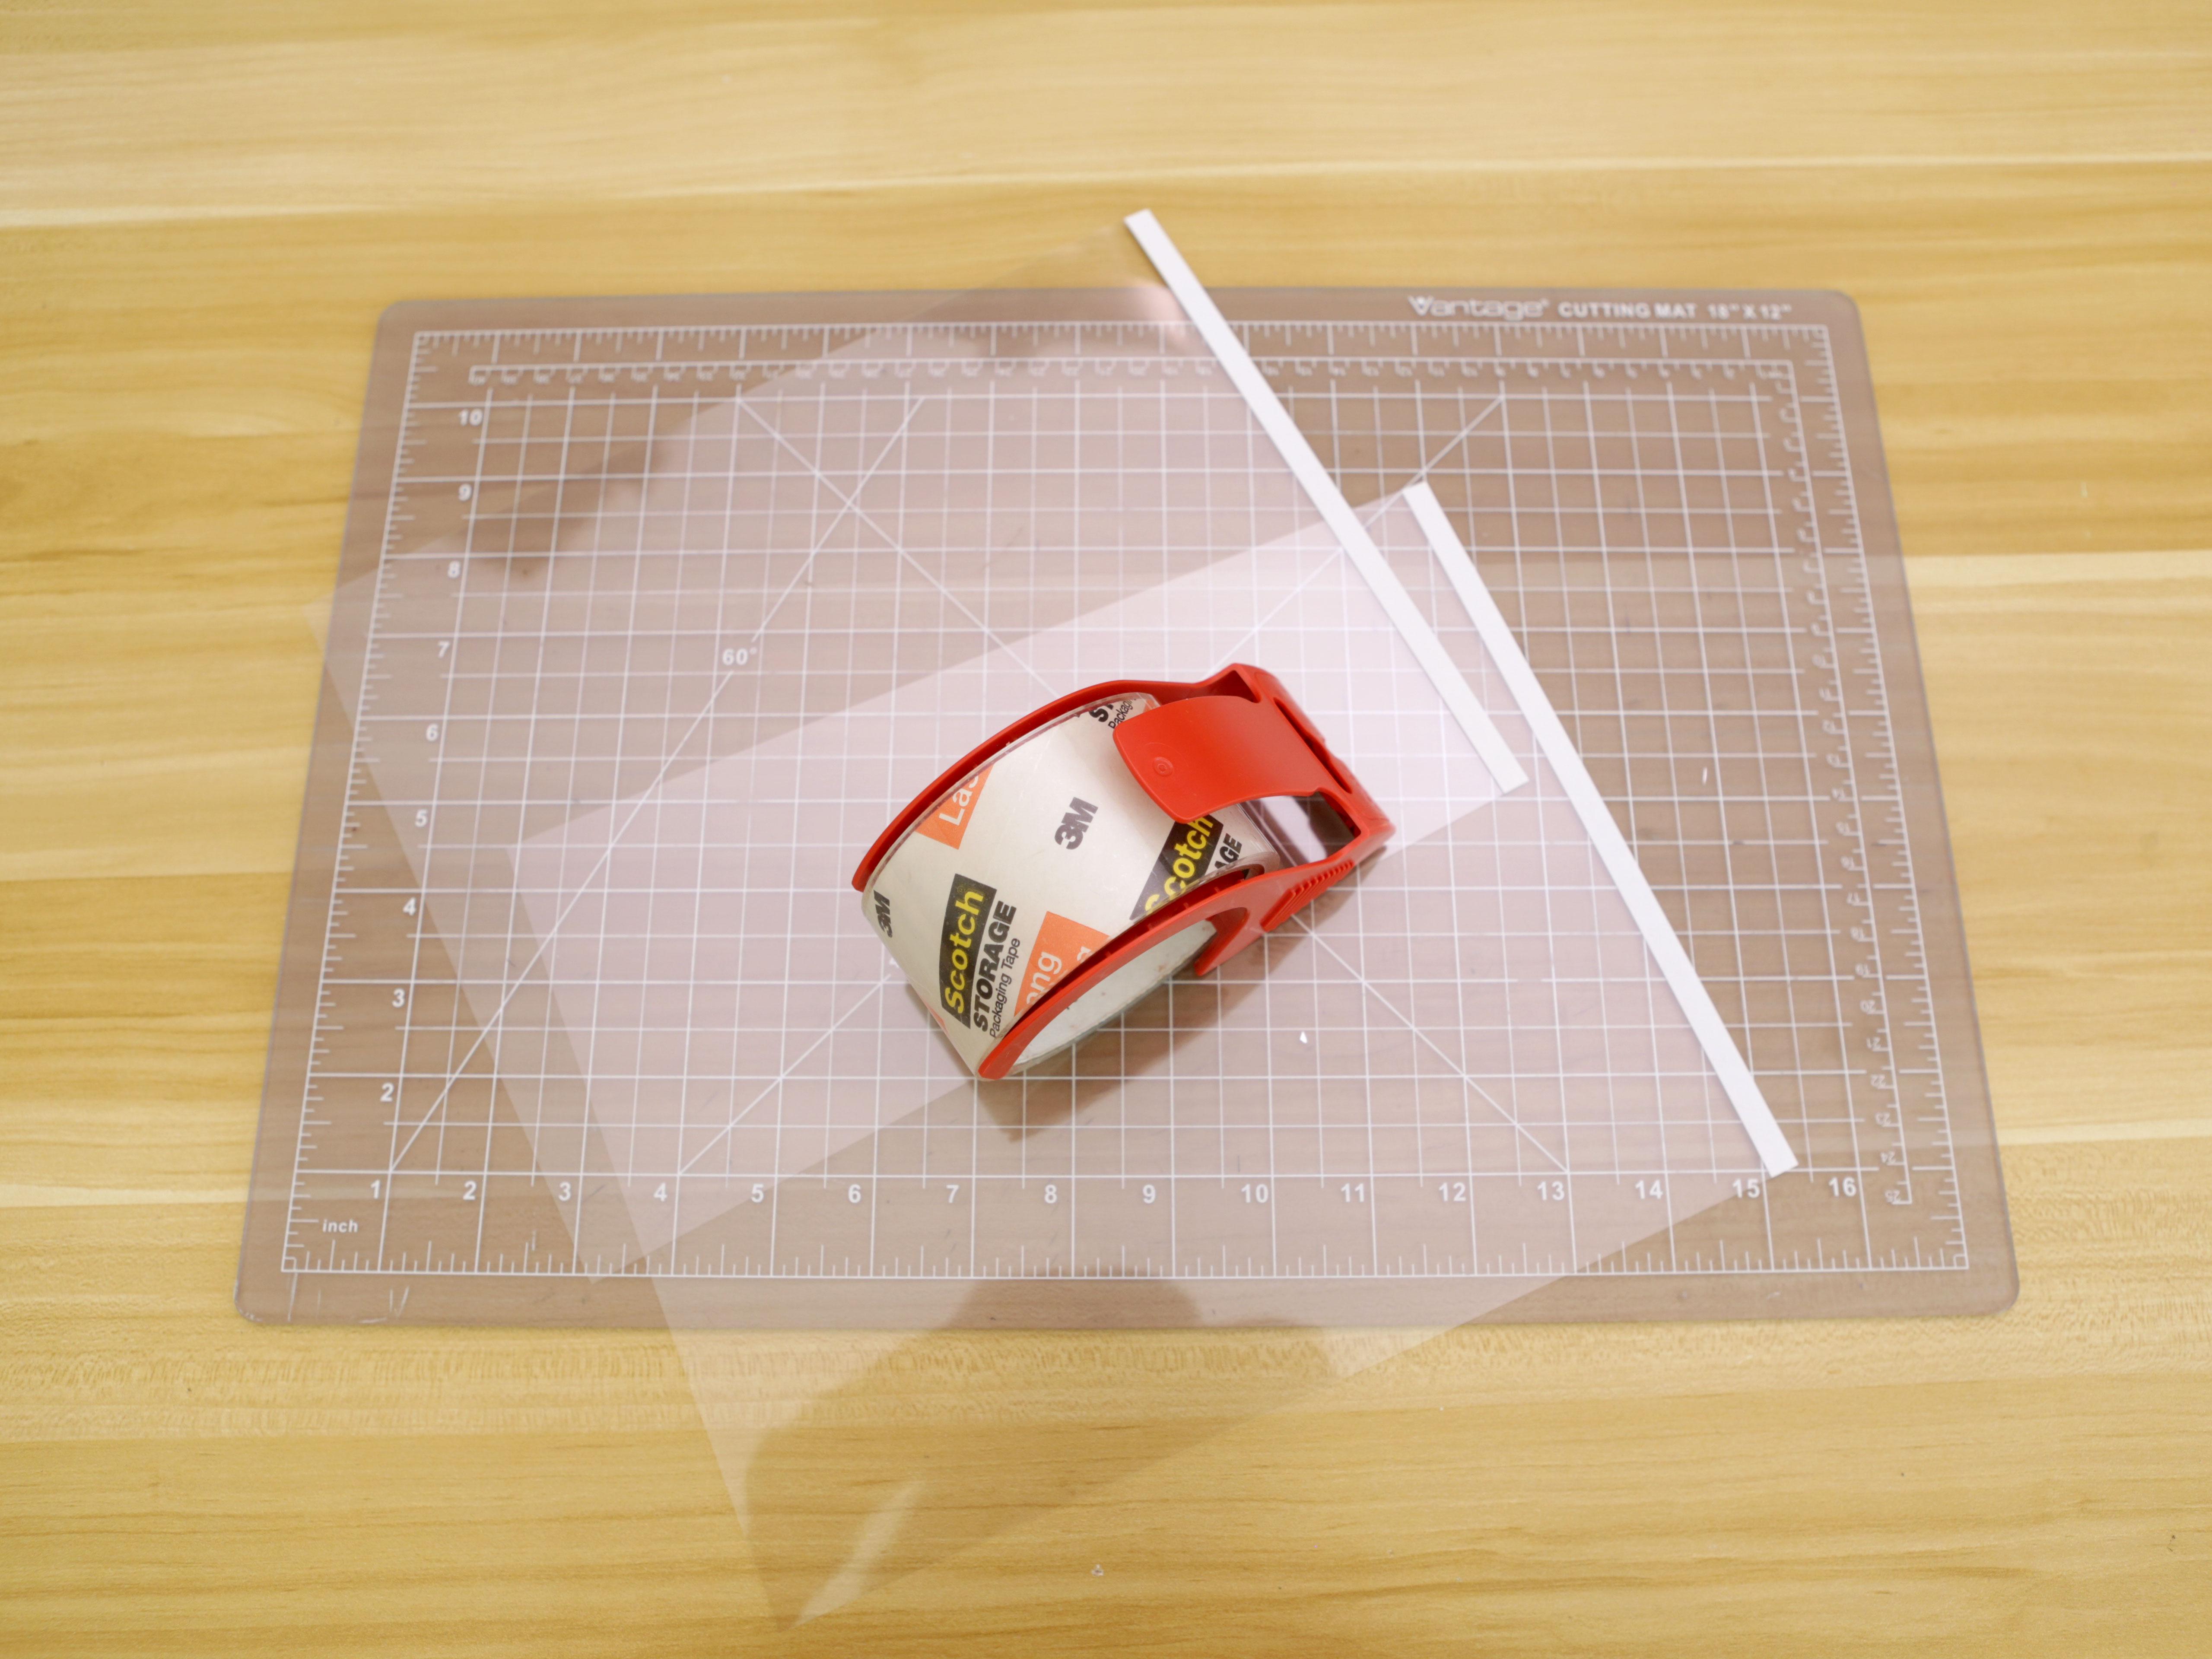 hacks_sheets-tape.jpg